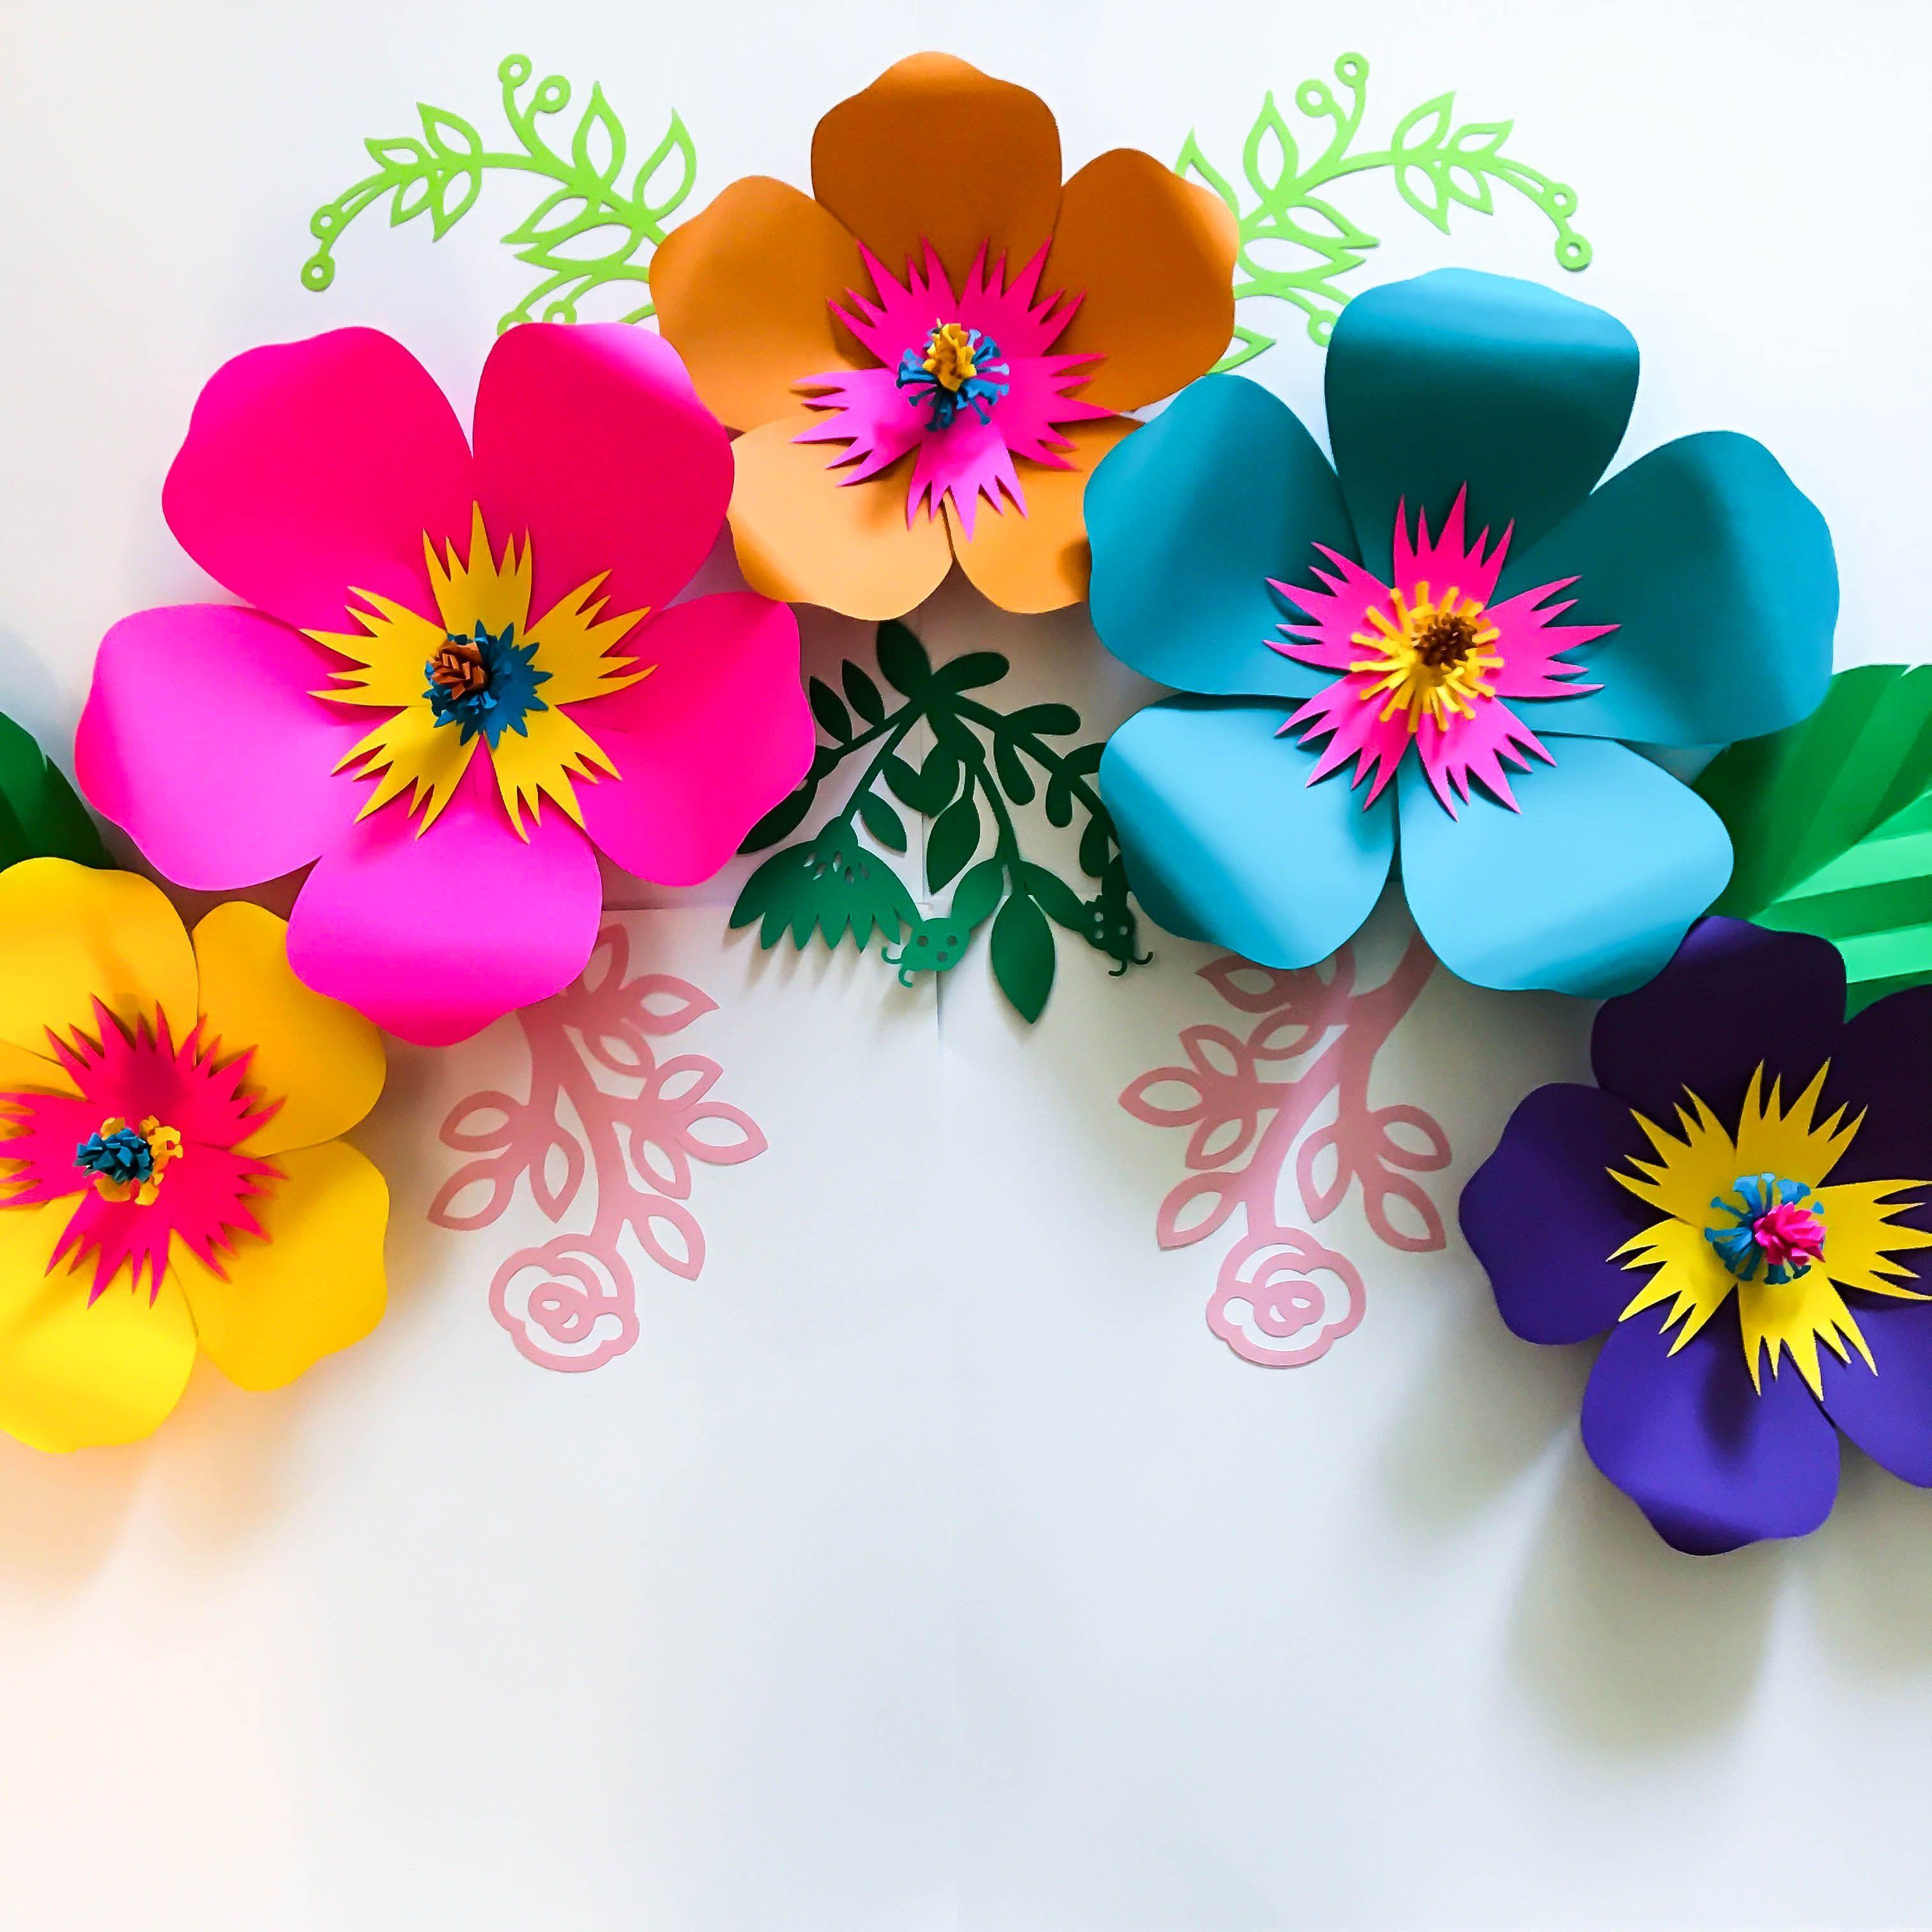 SVG PNG DXF Petal 101 Hibiscus Paper Flower Template DIY Cricut